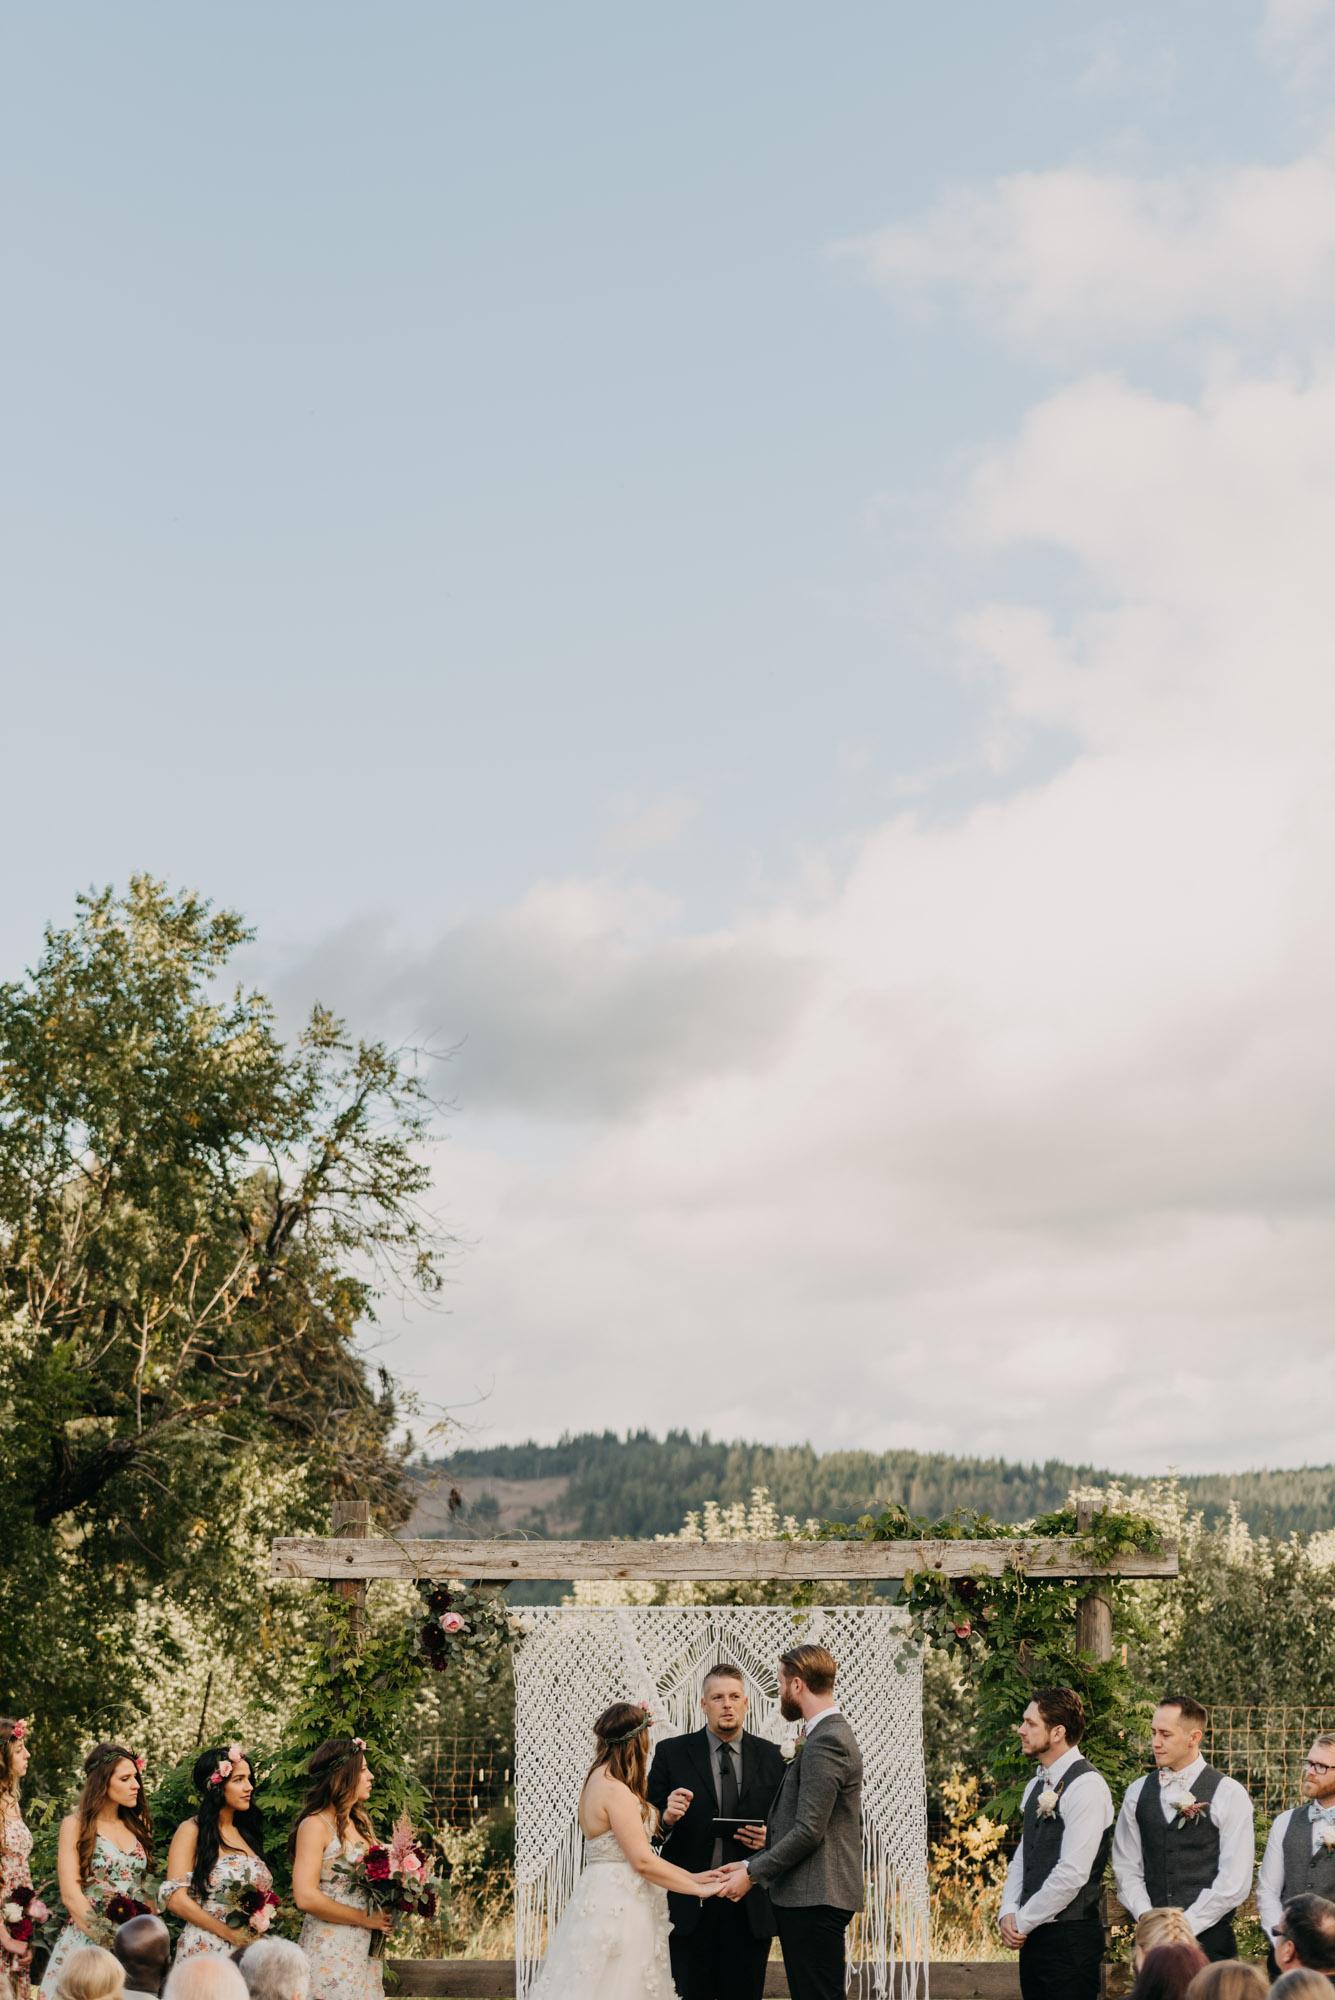 Outdoor-Summer-Ceremony-Washington-Wedding-Rainbow-8979.jpg